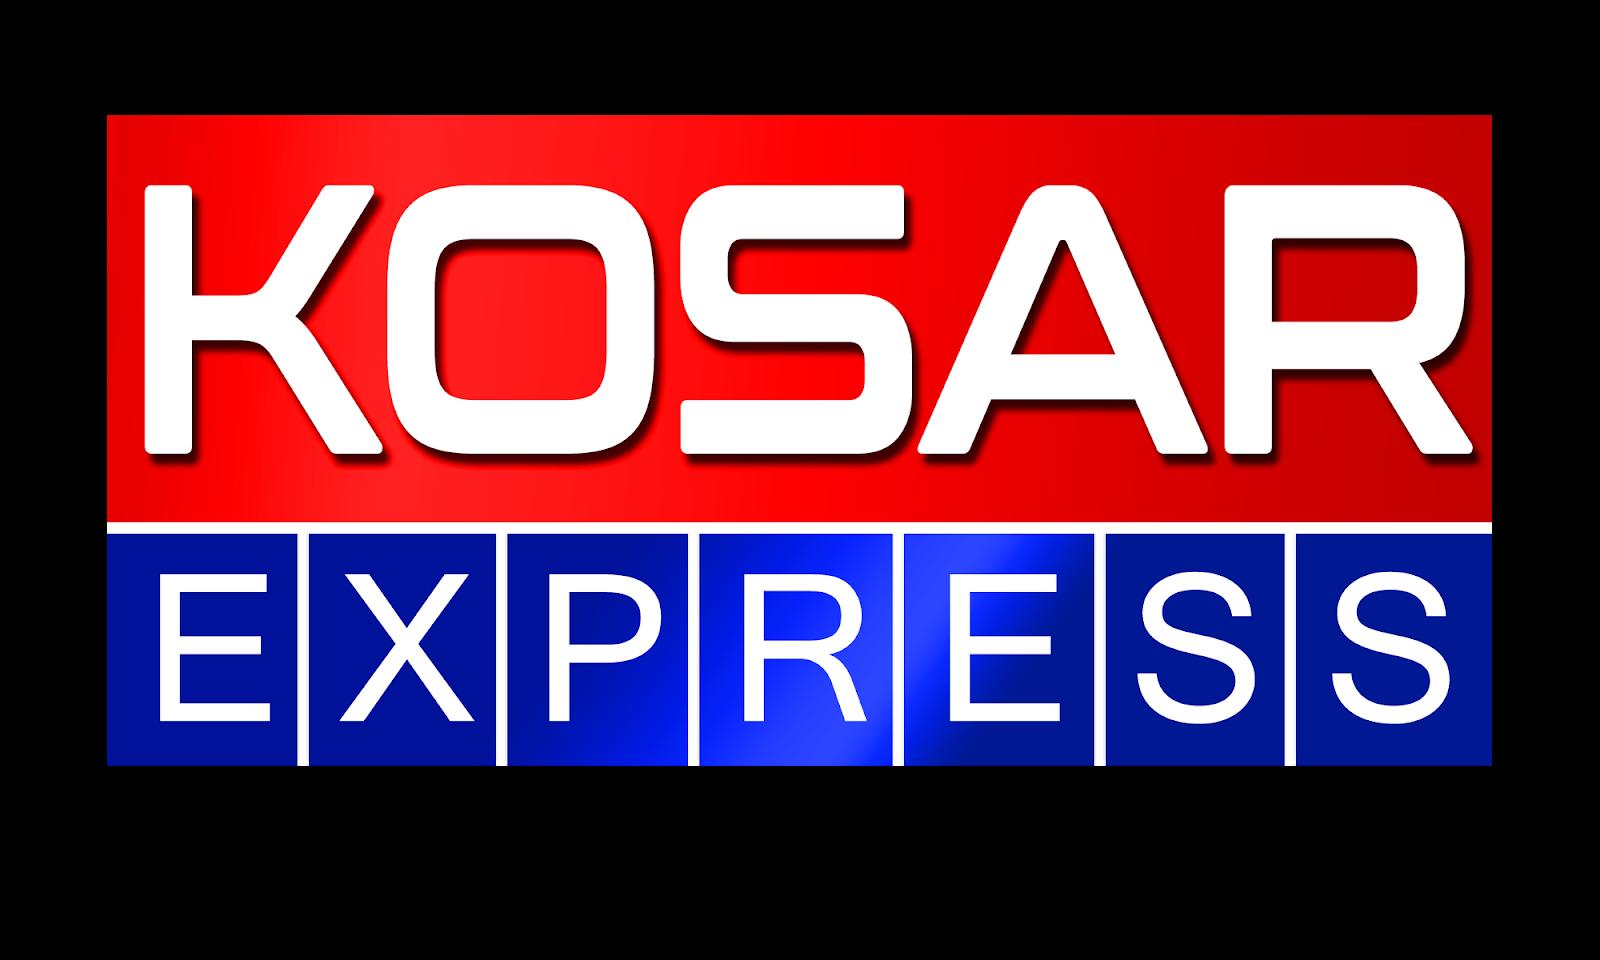 Kosar Express - कौसर एक्सप्रेस (Dewas News | देवास न्यूज़)